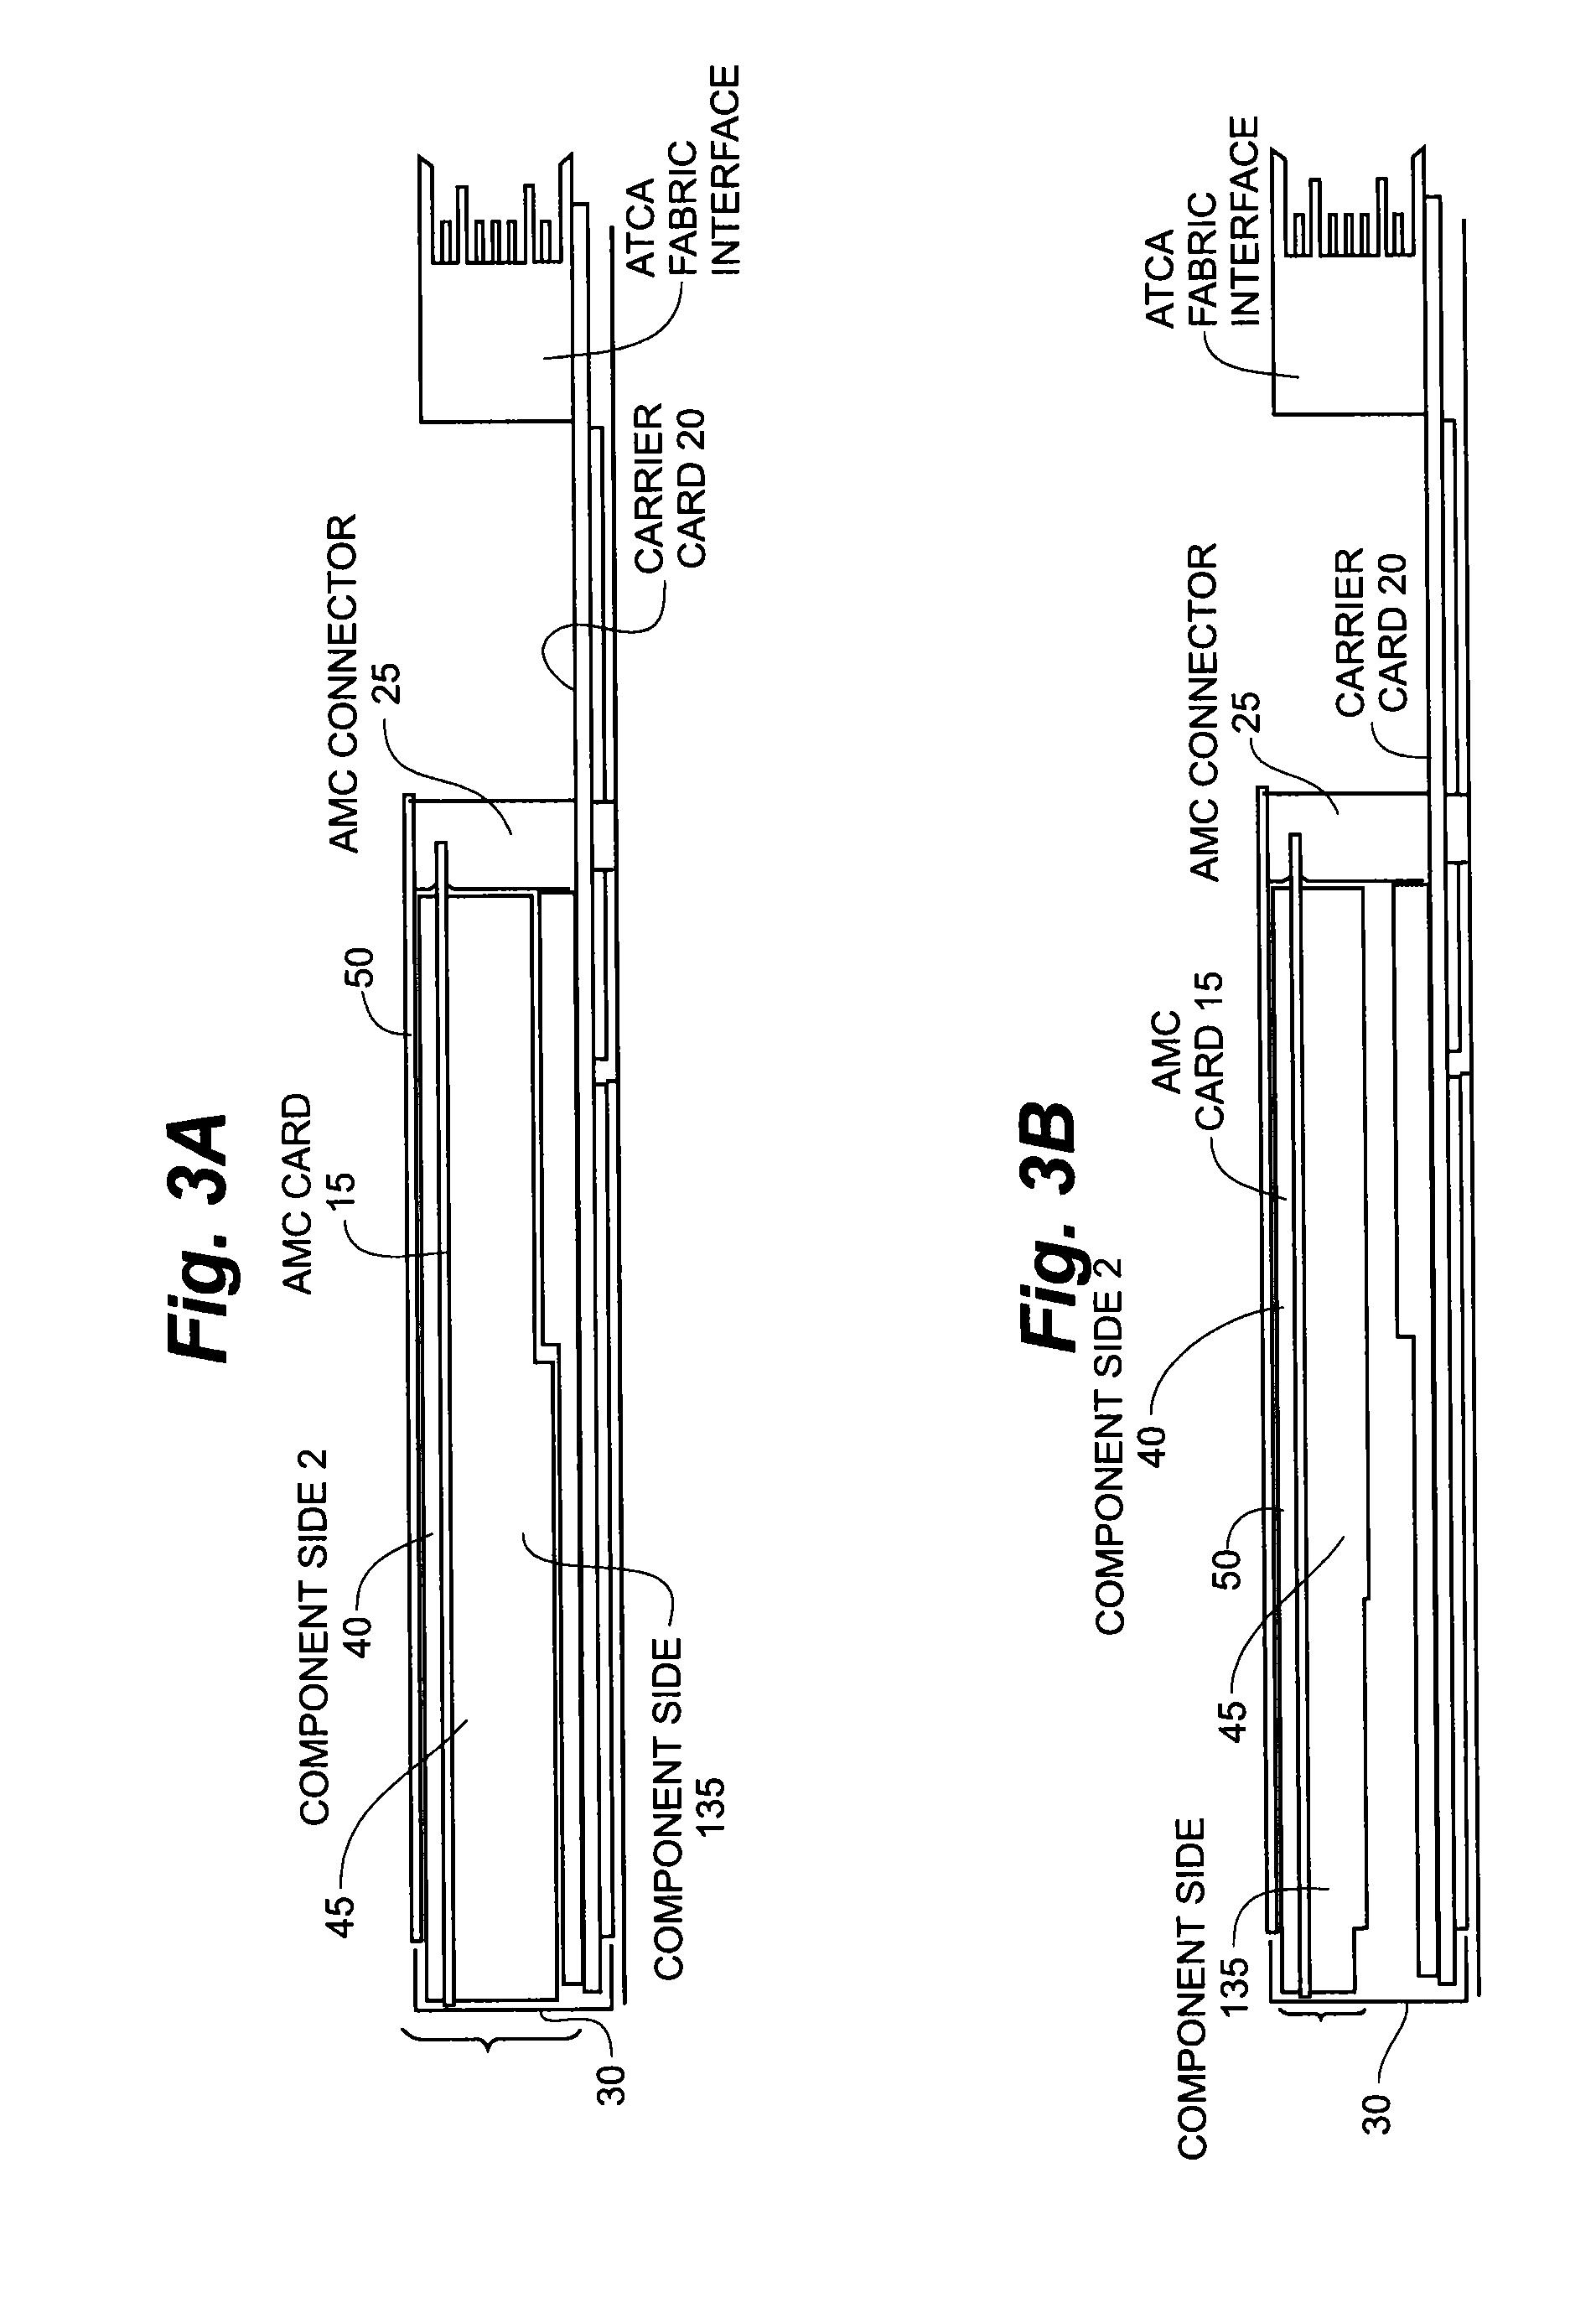 Patent Us20090251867 Reconfigurable Modularized Fpga Based Amc Cable Pinout Fabrication Diagrams Drawing